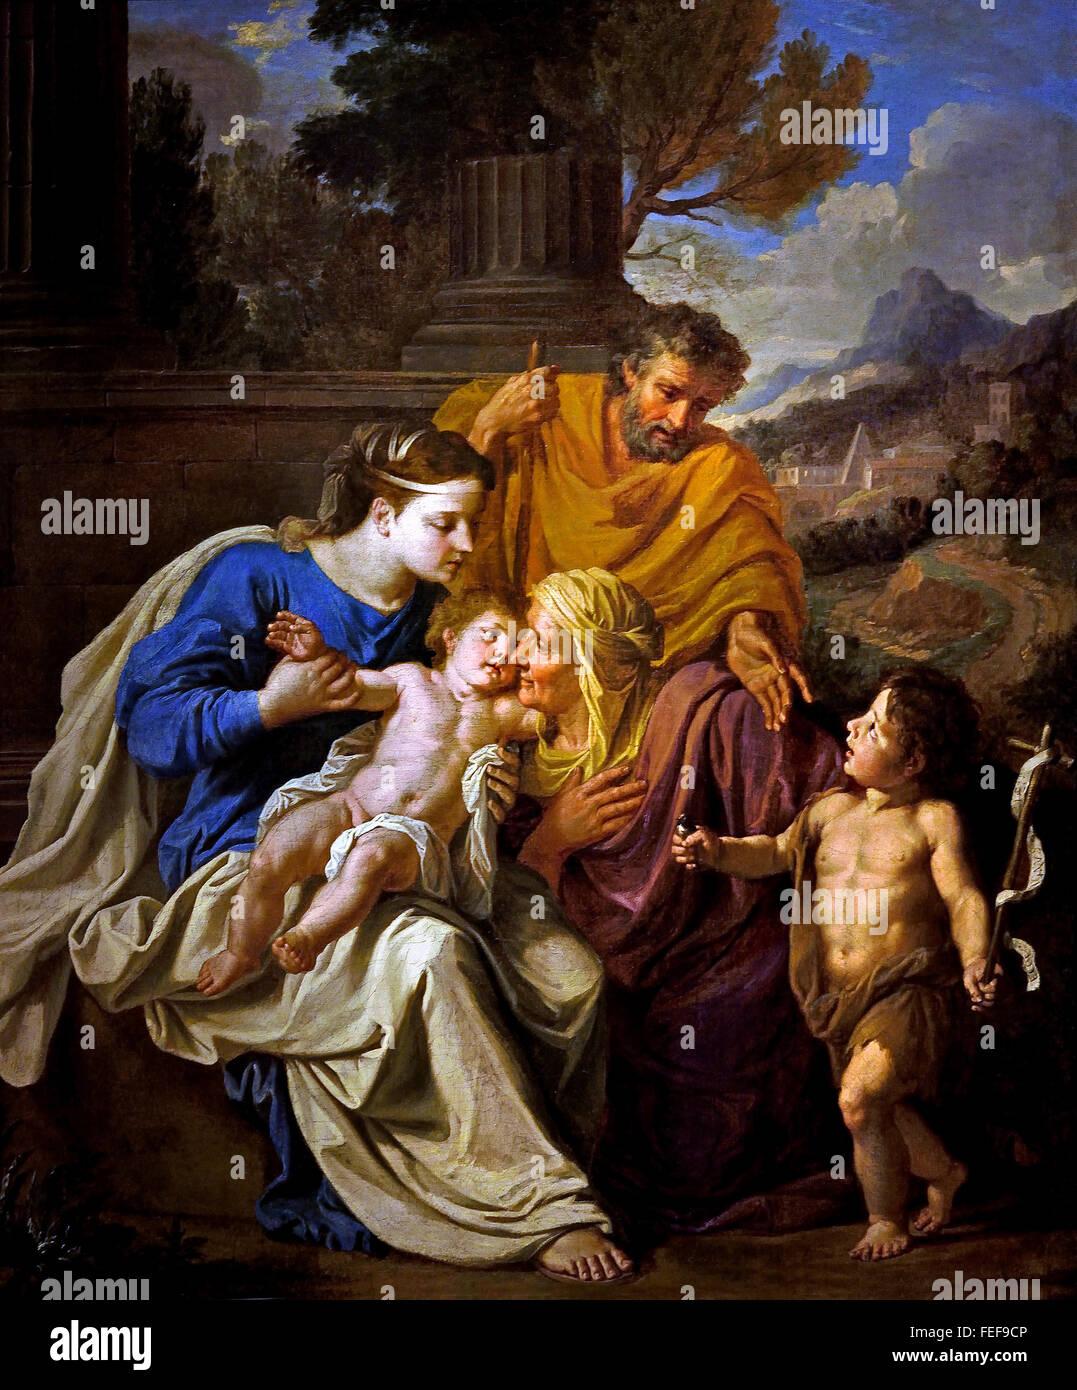 Image De Noel Jesus.Holy Family With St Elizabeth And John The Baptist Noel